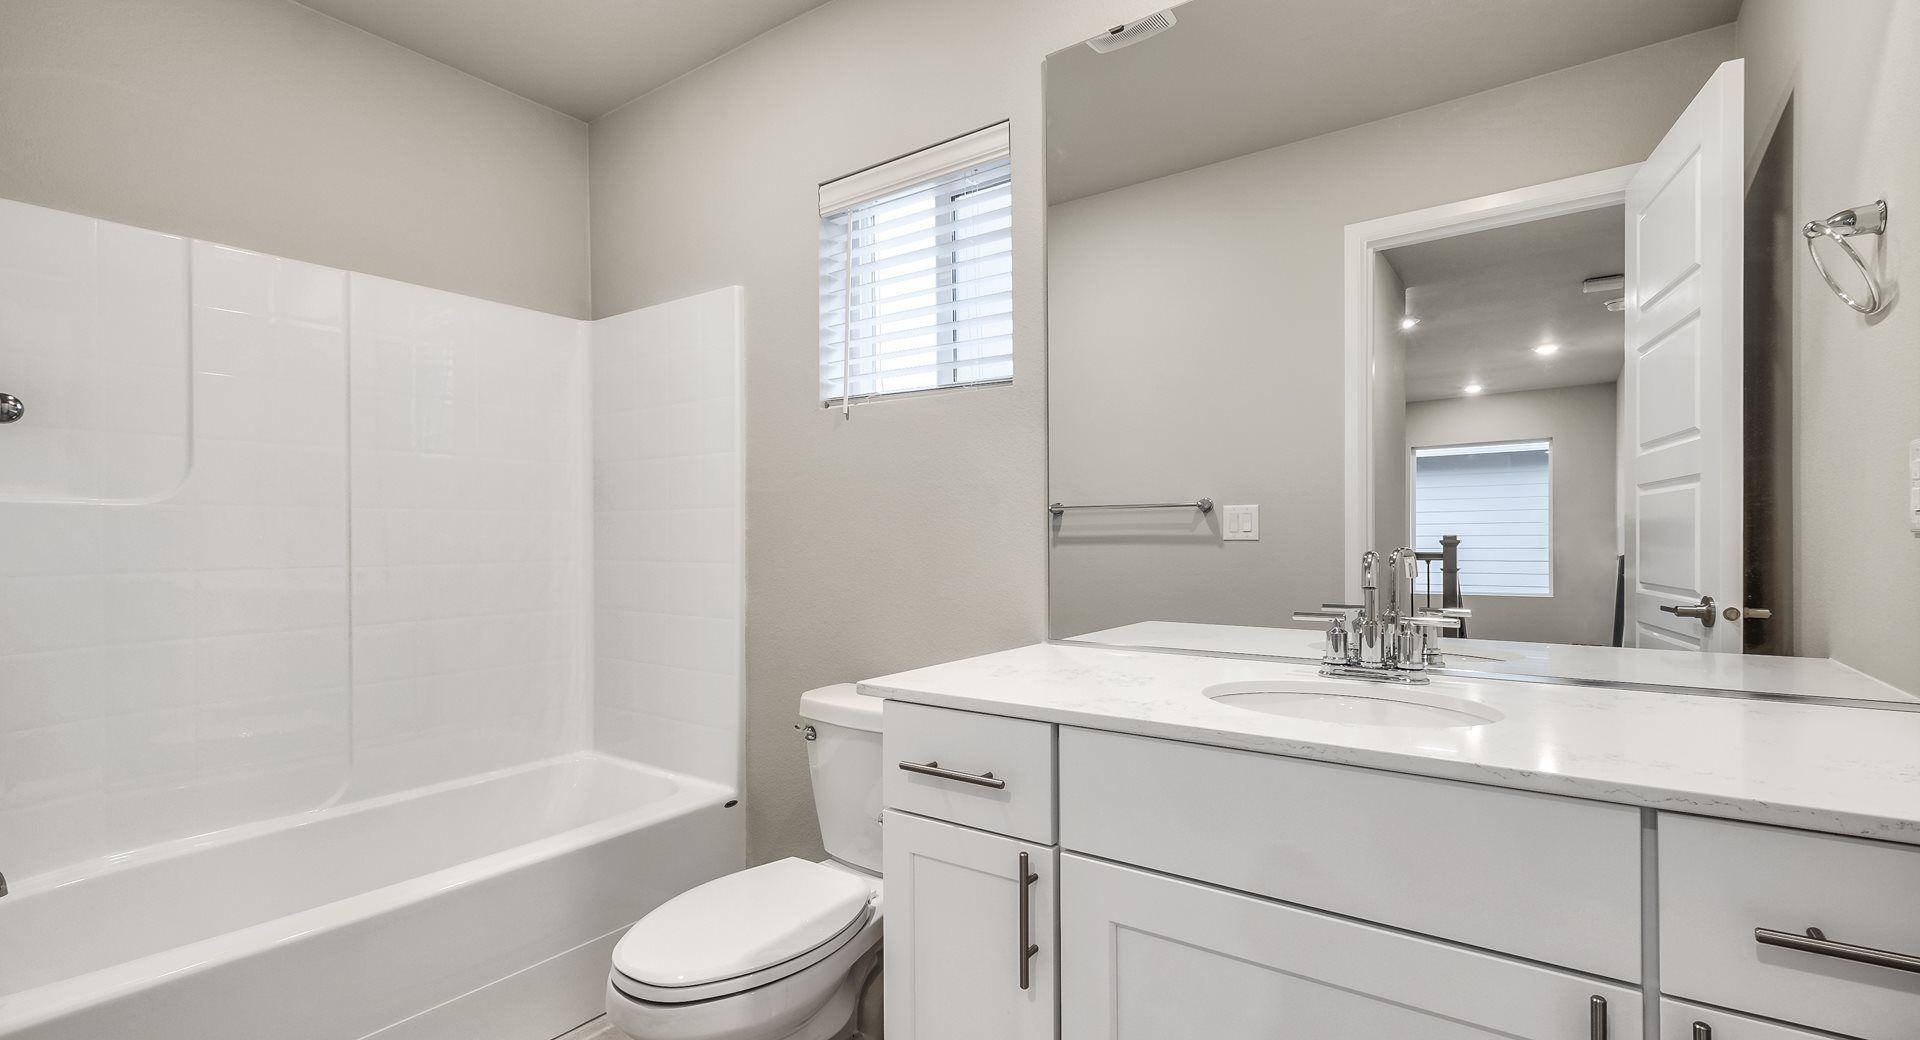 Bathroom featured in the Chelan By Lennar in Seattle-Bellevue, WA